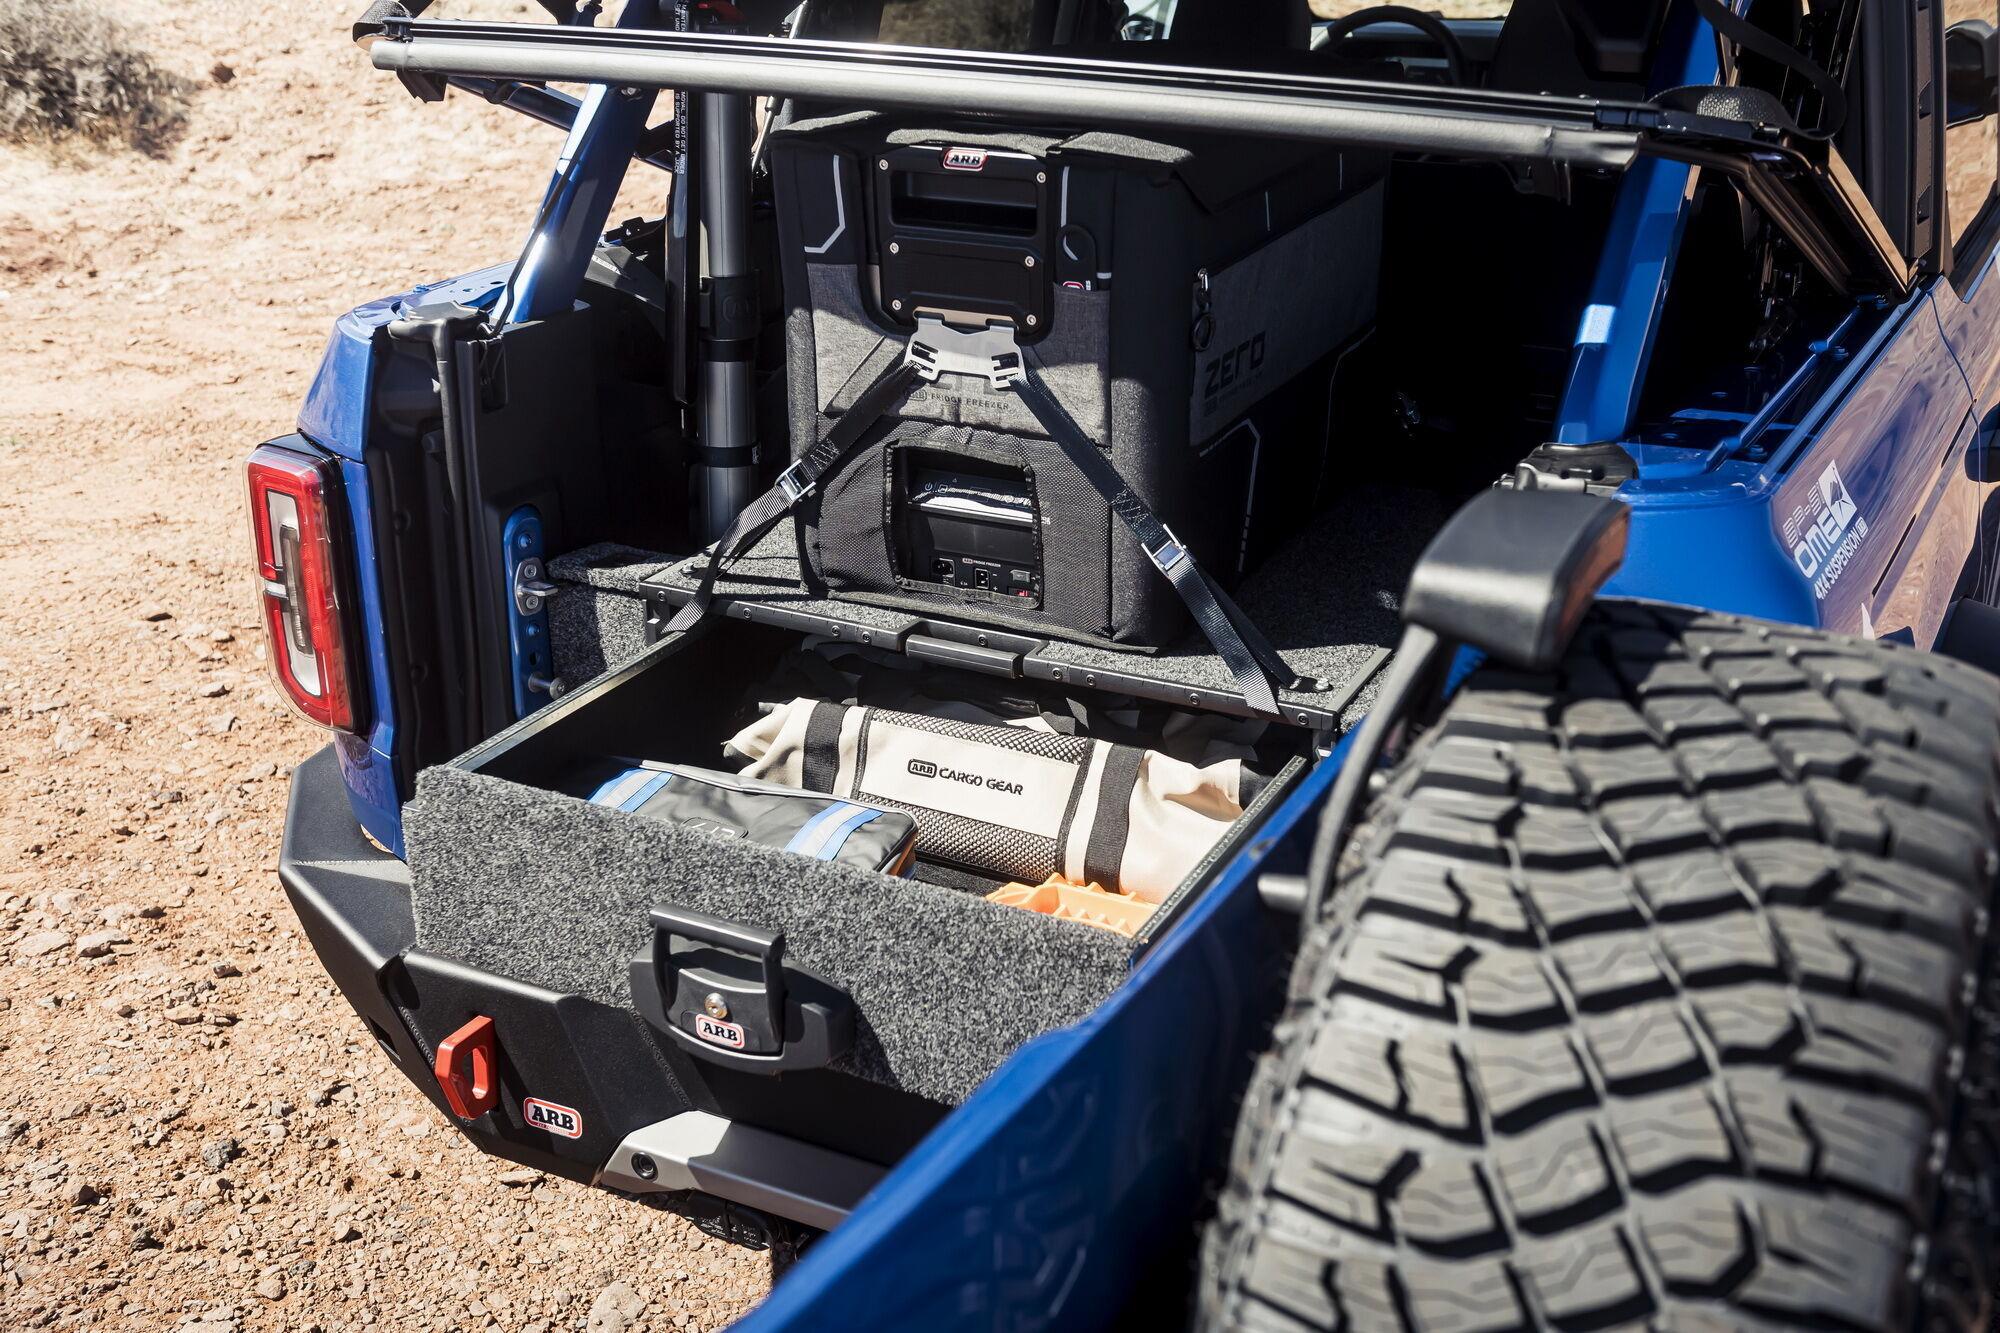 Custom Bronco від ARB 4x4 Accessories